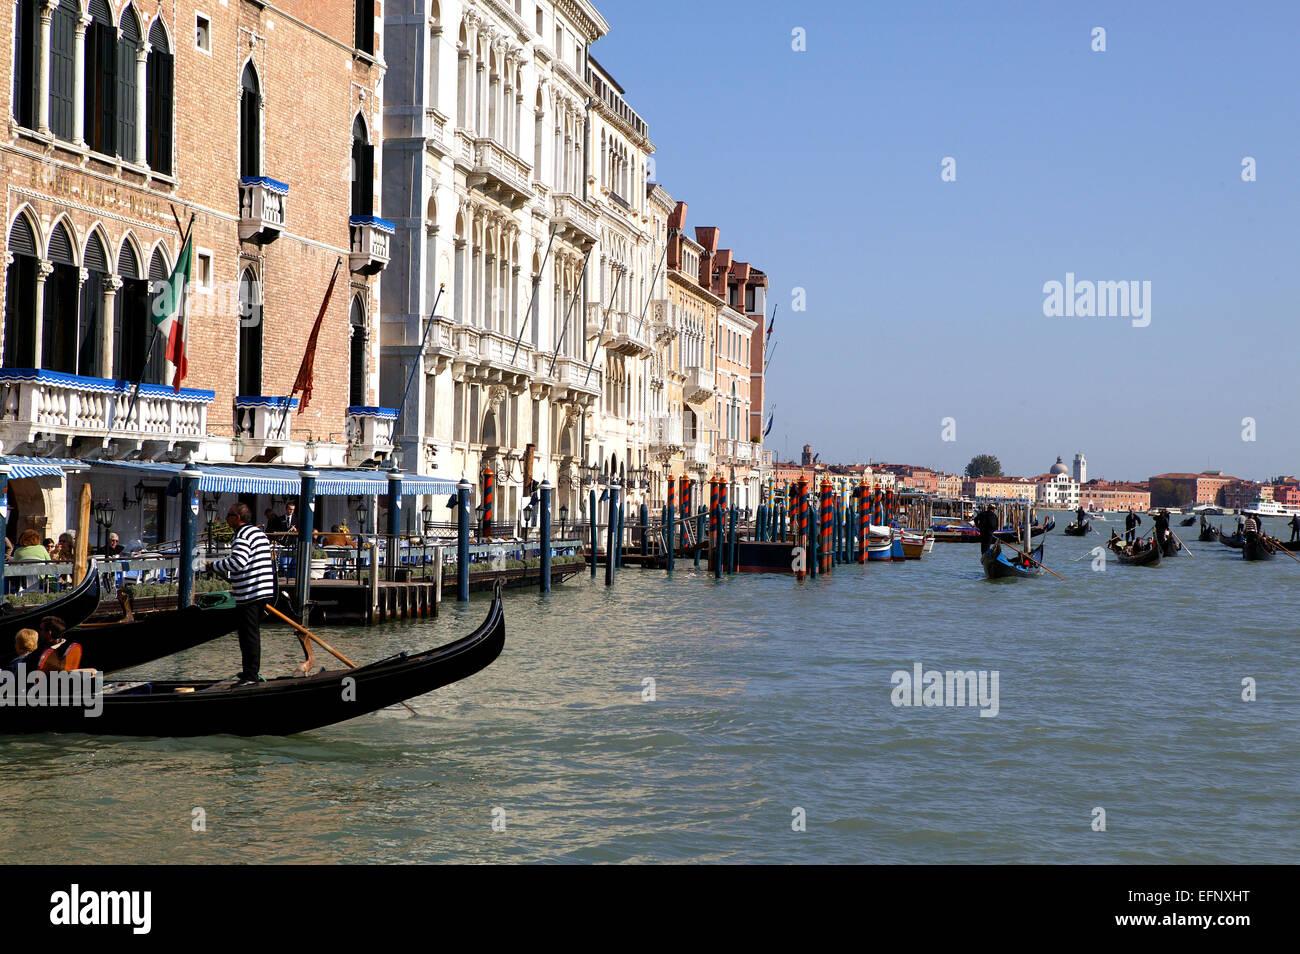 Italien Lagune Venedig Canale Grande Gondeln Touristen Haeuser Kanal Europa Sueden Stadt Stadtansicht Wohnhaeuser - Stock Image